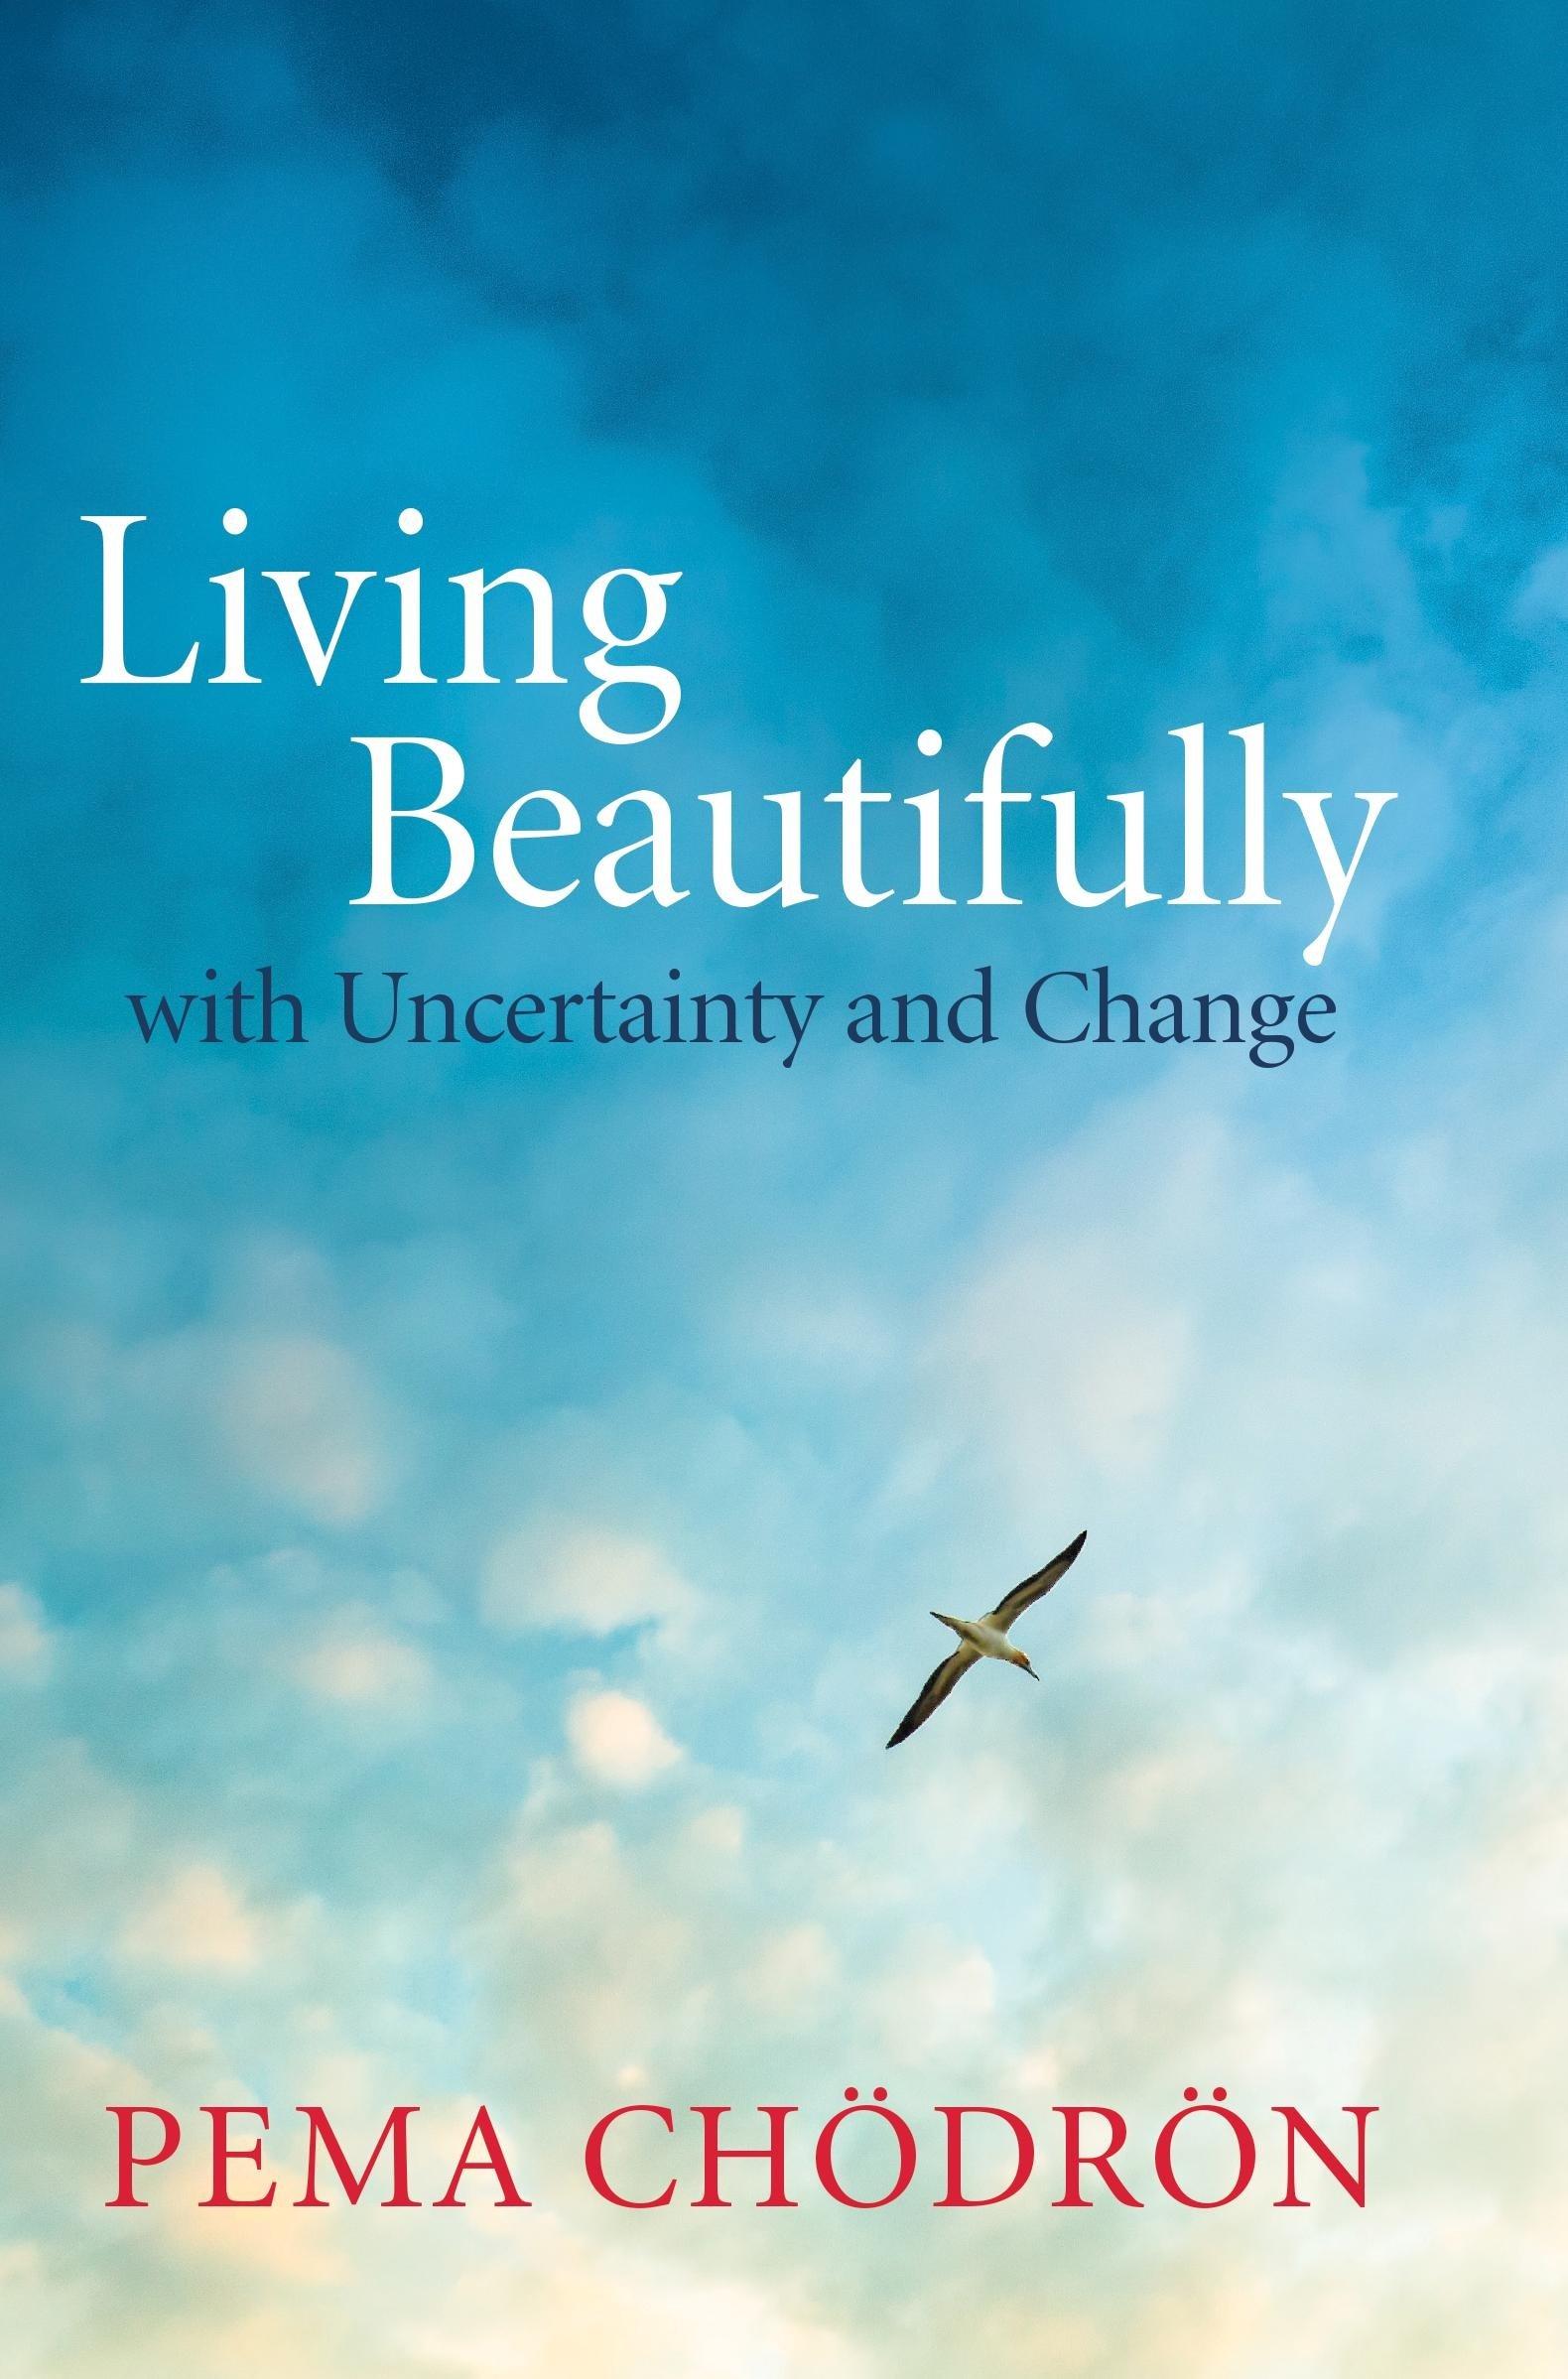 Living Beautifully Uncertainty Pema Chodron product image